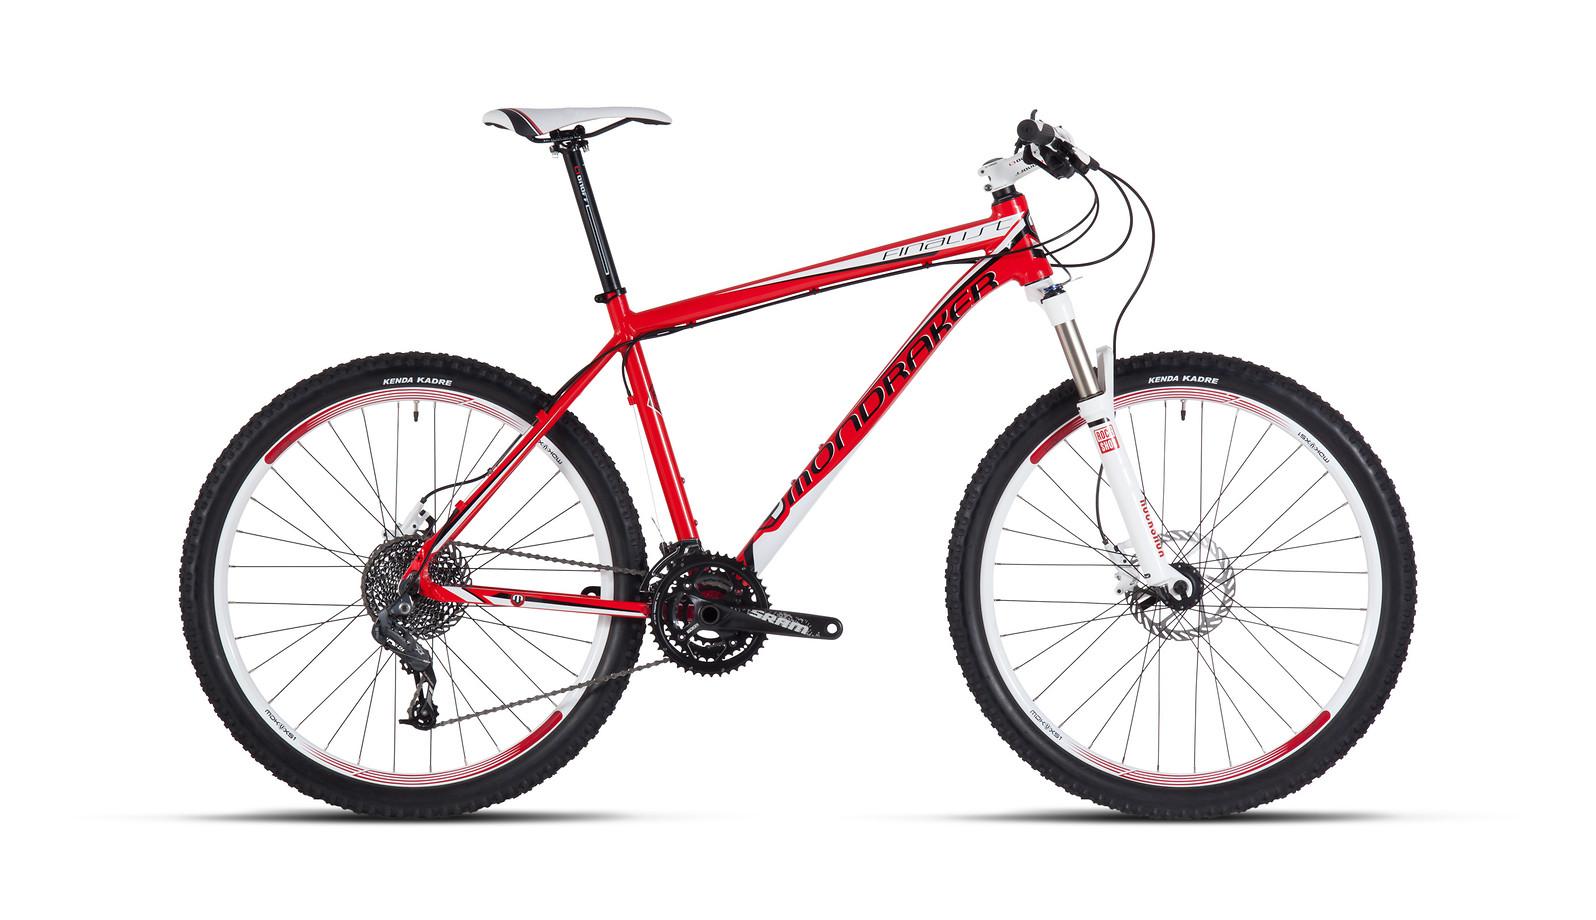 2013 Mondraker Finalist Bike bike - mondraker finalist